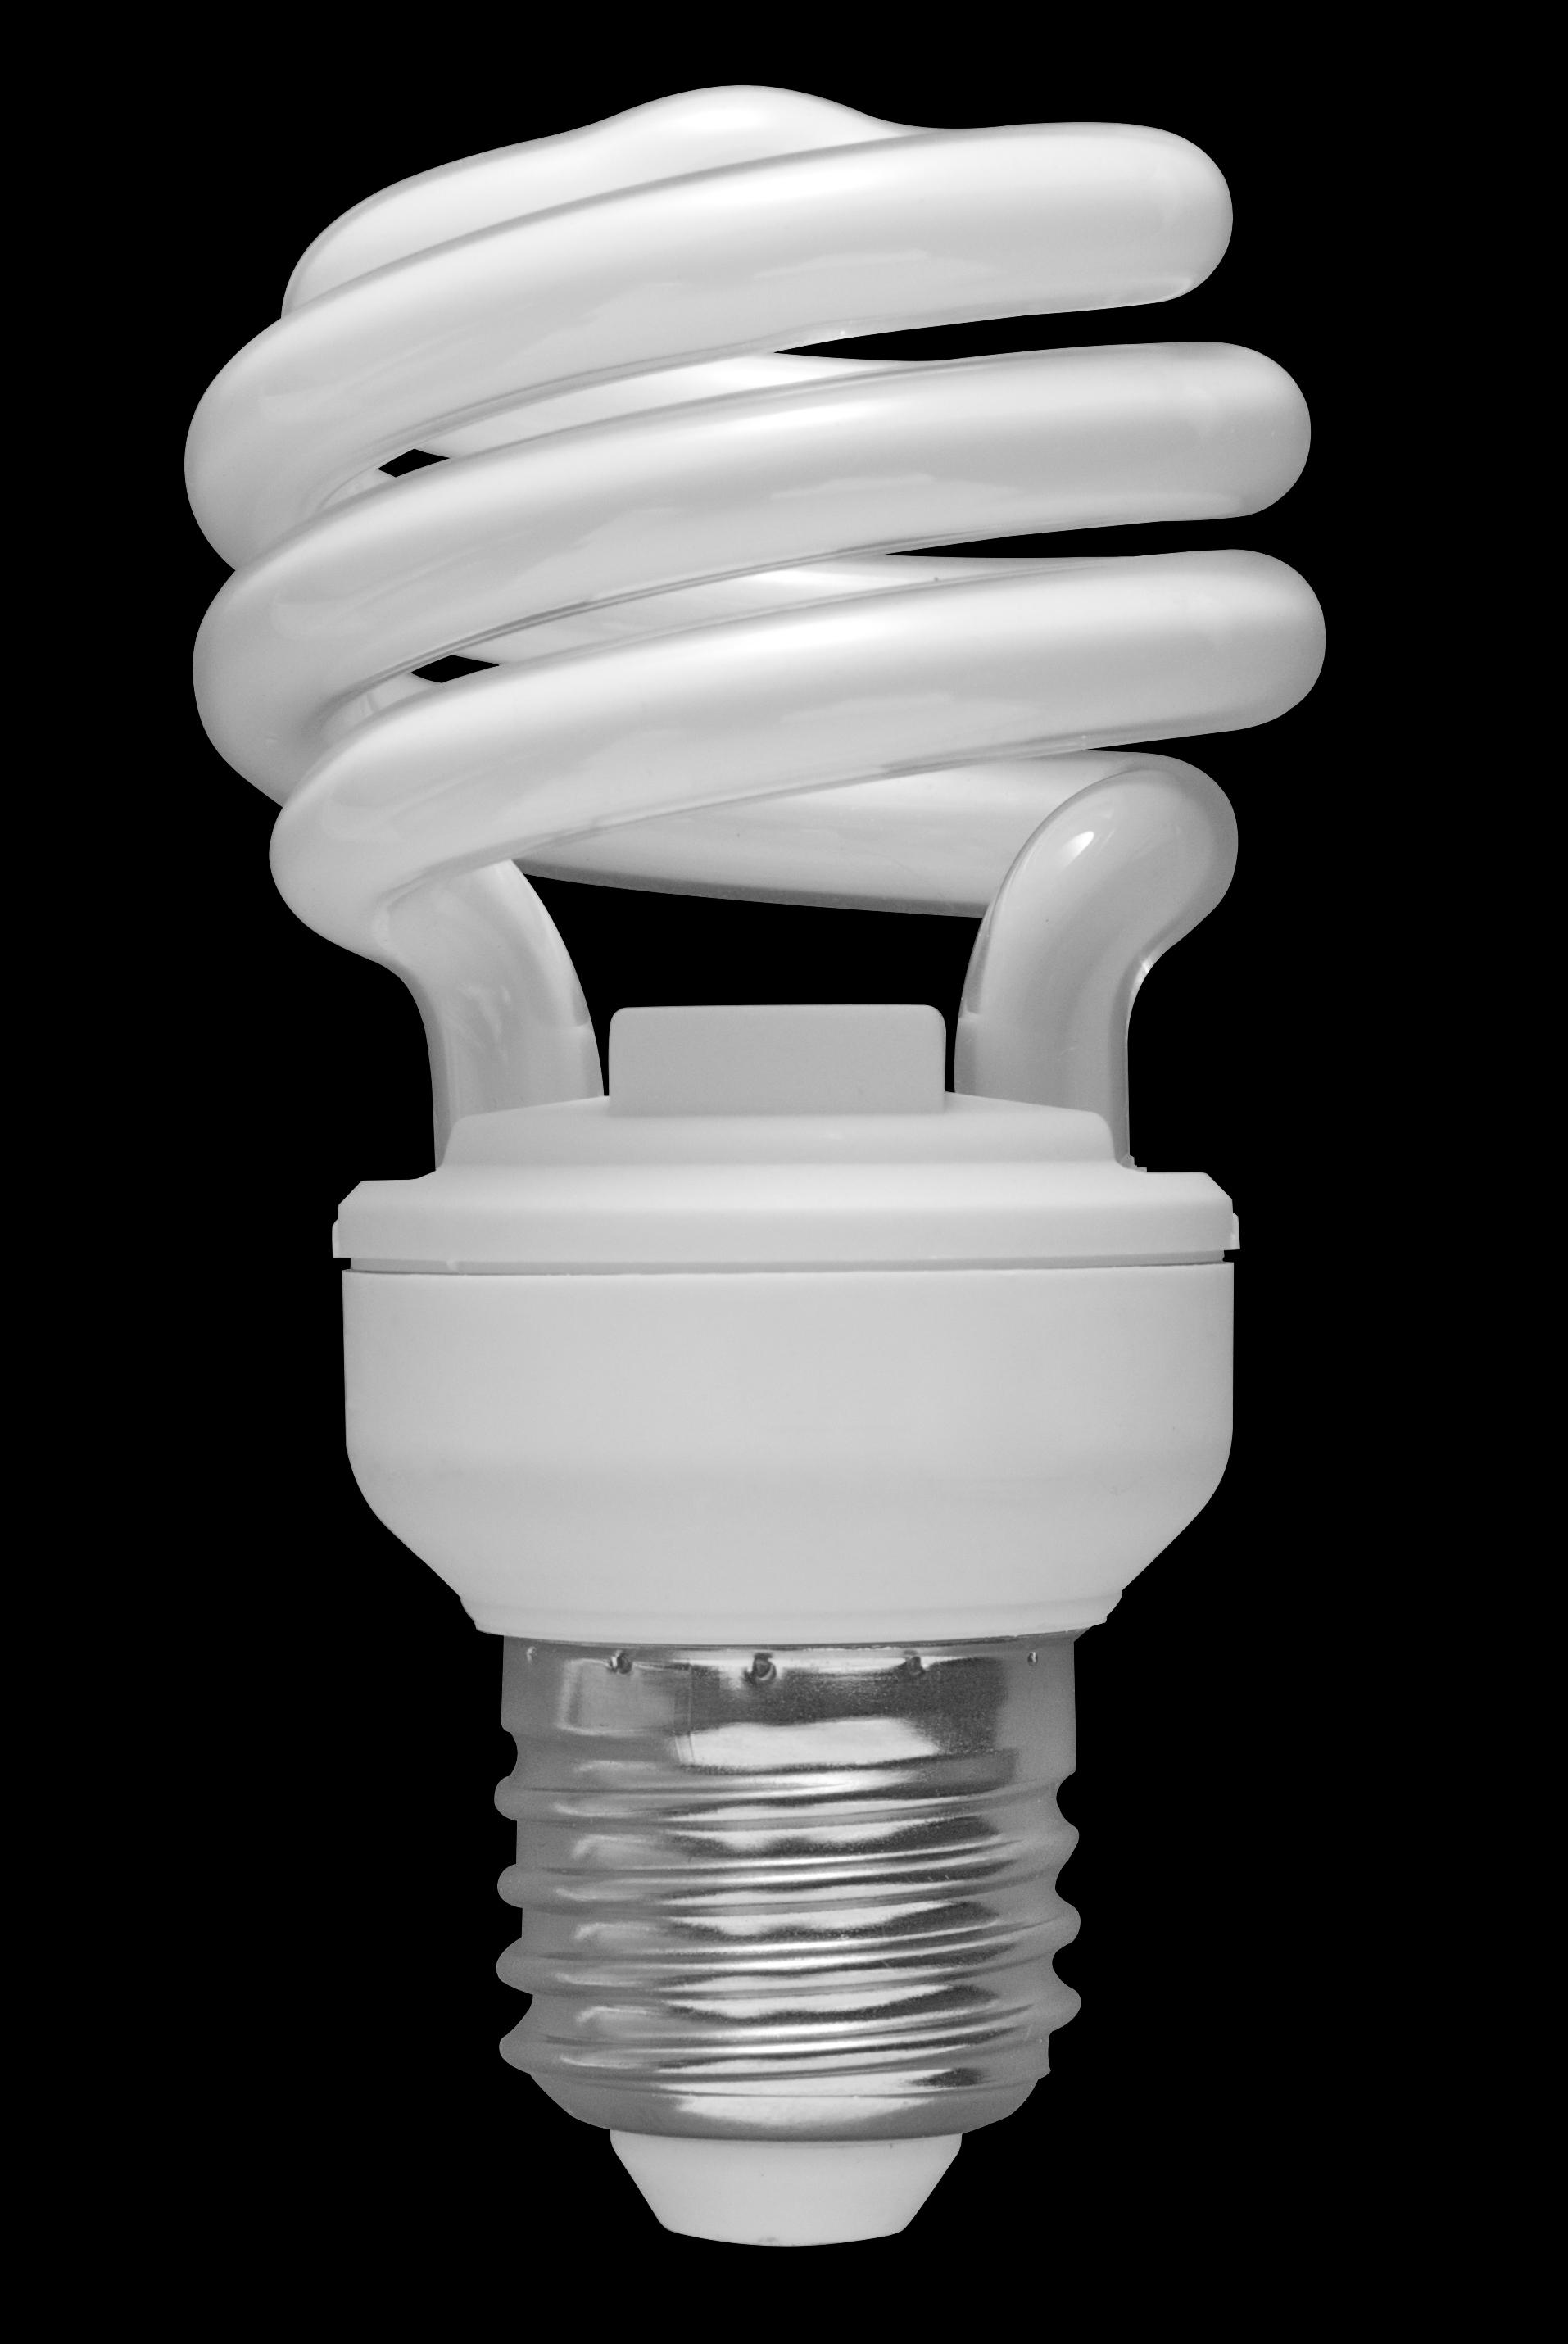 Fluorescent Light Bulbs Green Solution Or Not Really